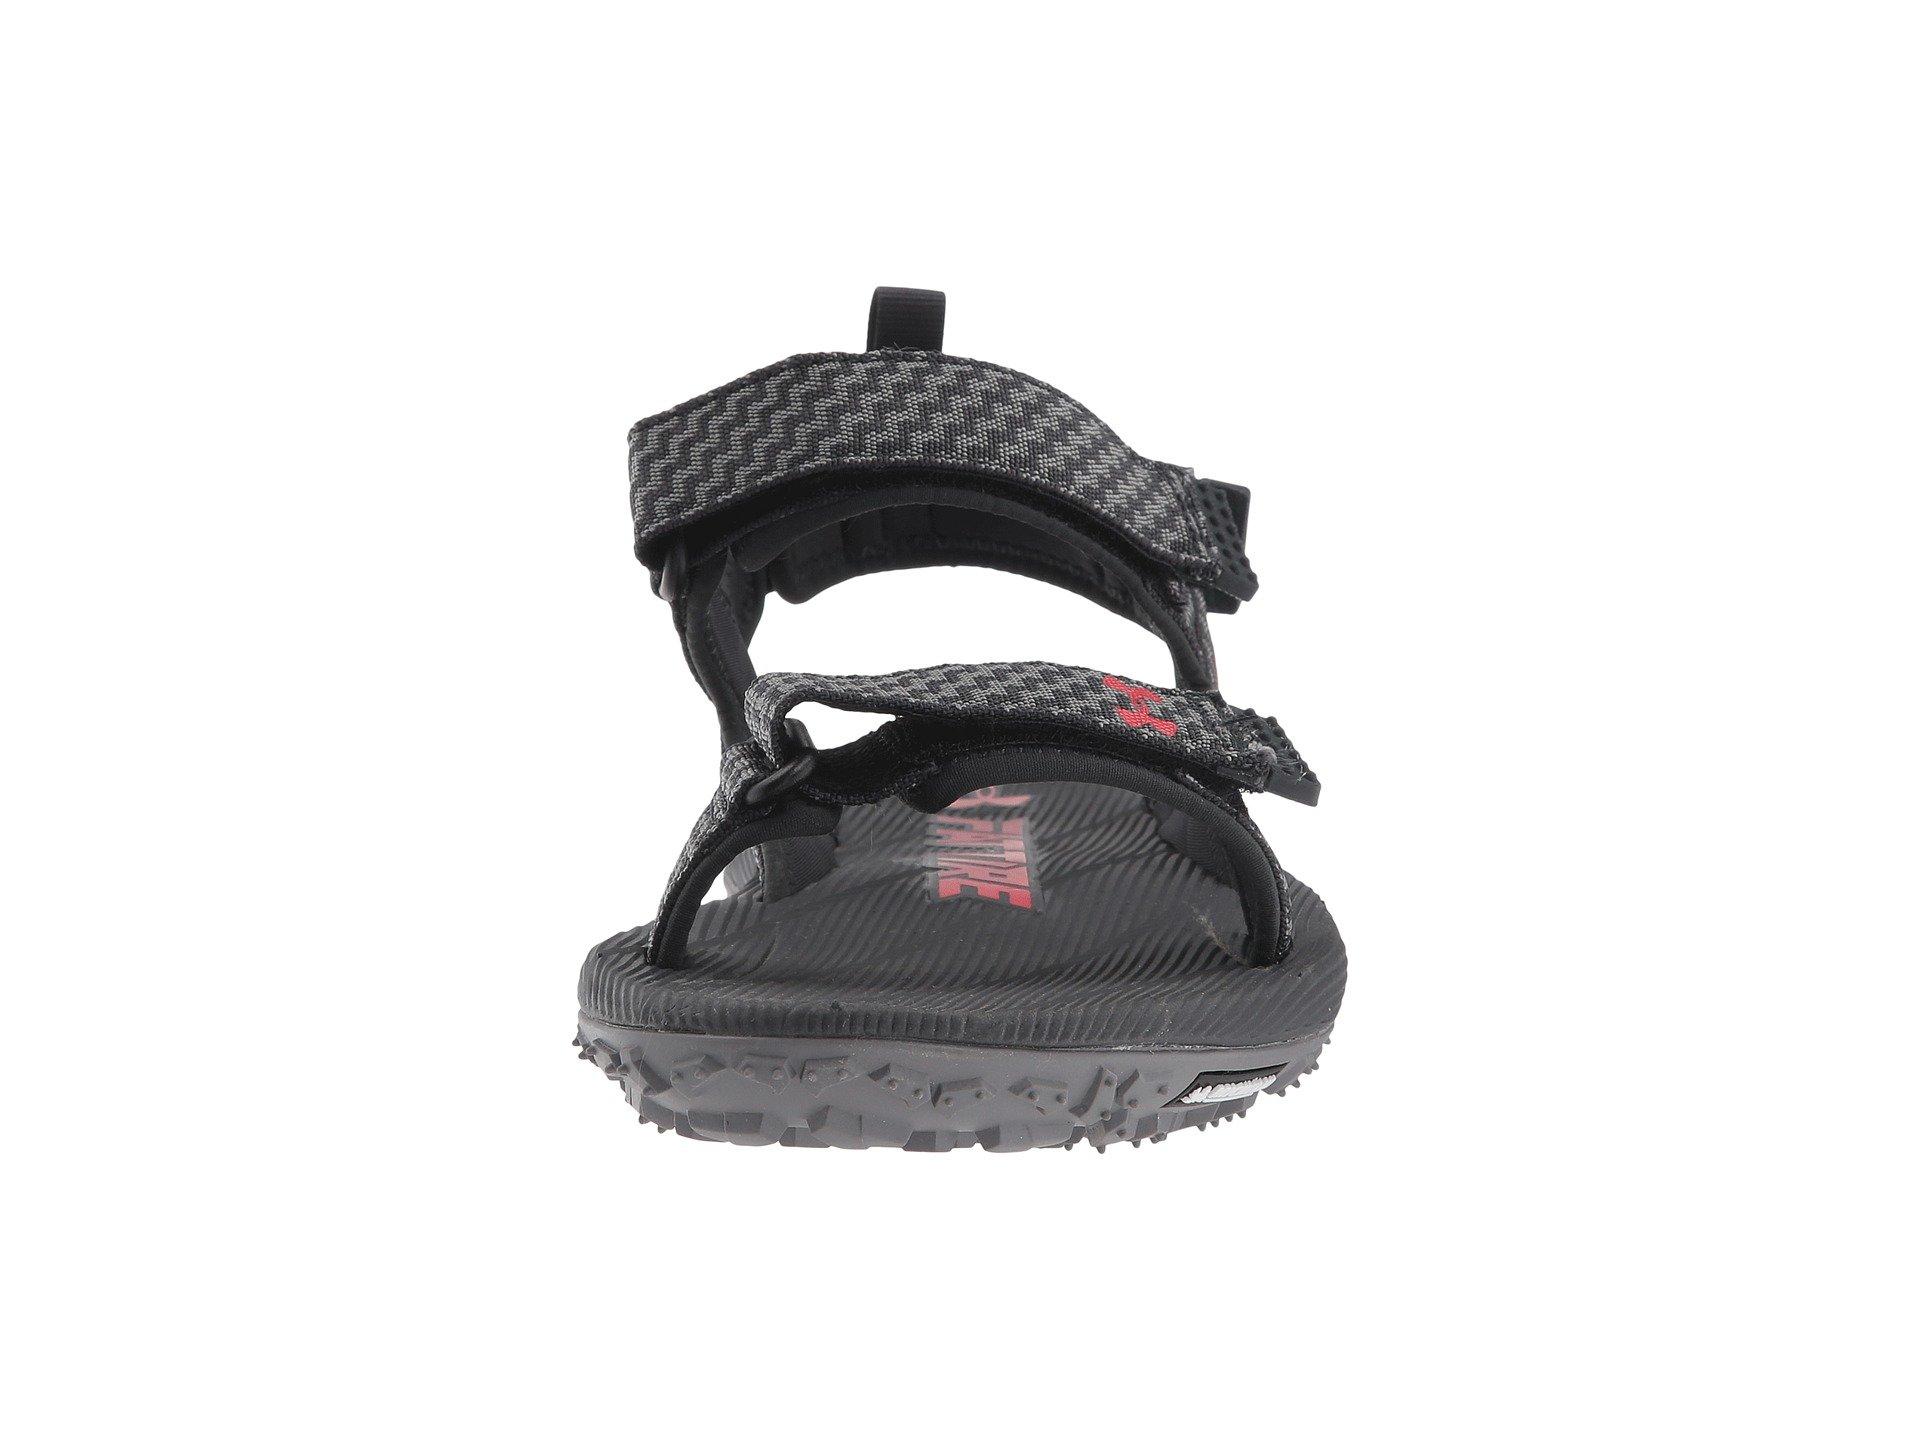 Sandal pierce Gray zinc Fat Armour Ua Under Tire Anthracite wWT6HITq8